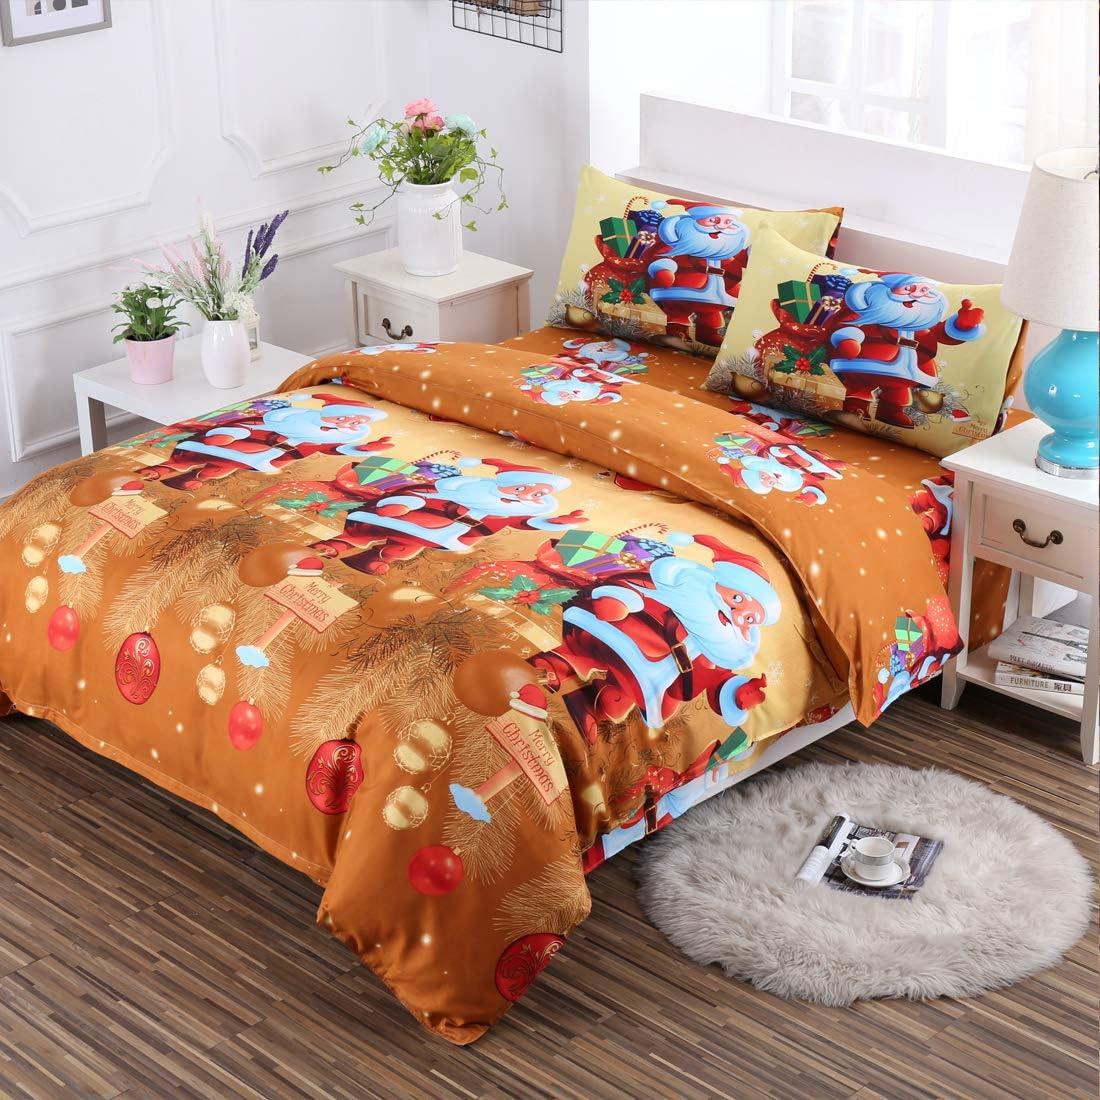 Oliven 4 Pieces 3D Christmas Bedding Set Full Size Cartoon Santa Claus Duvet Cover Flat Sheet Standard Pillowcases-Gold,Christmas Home Decor